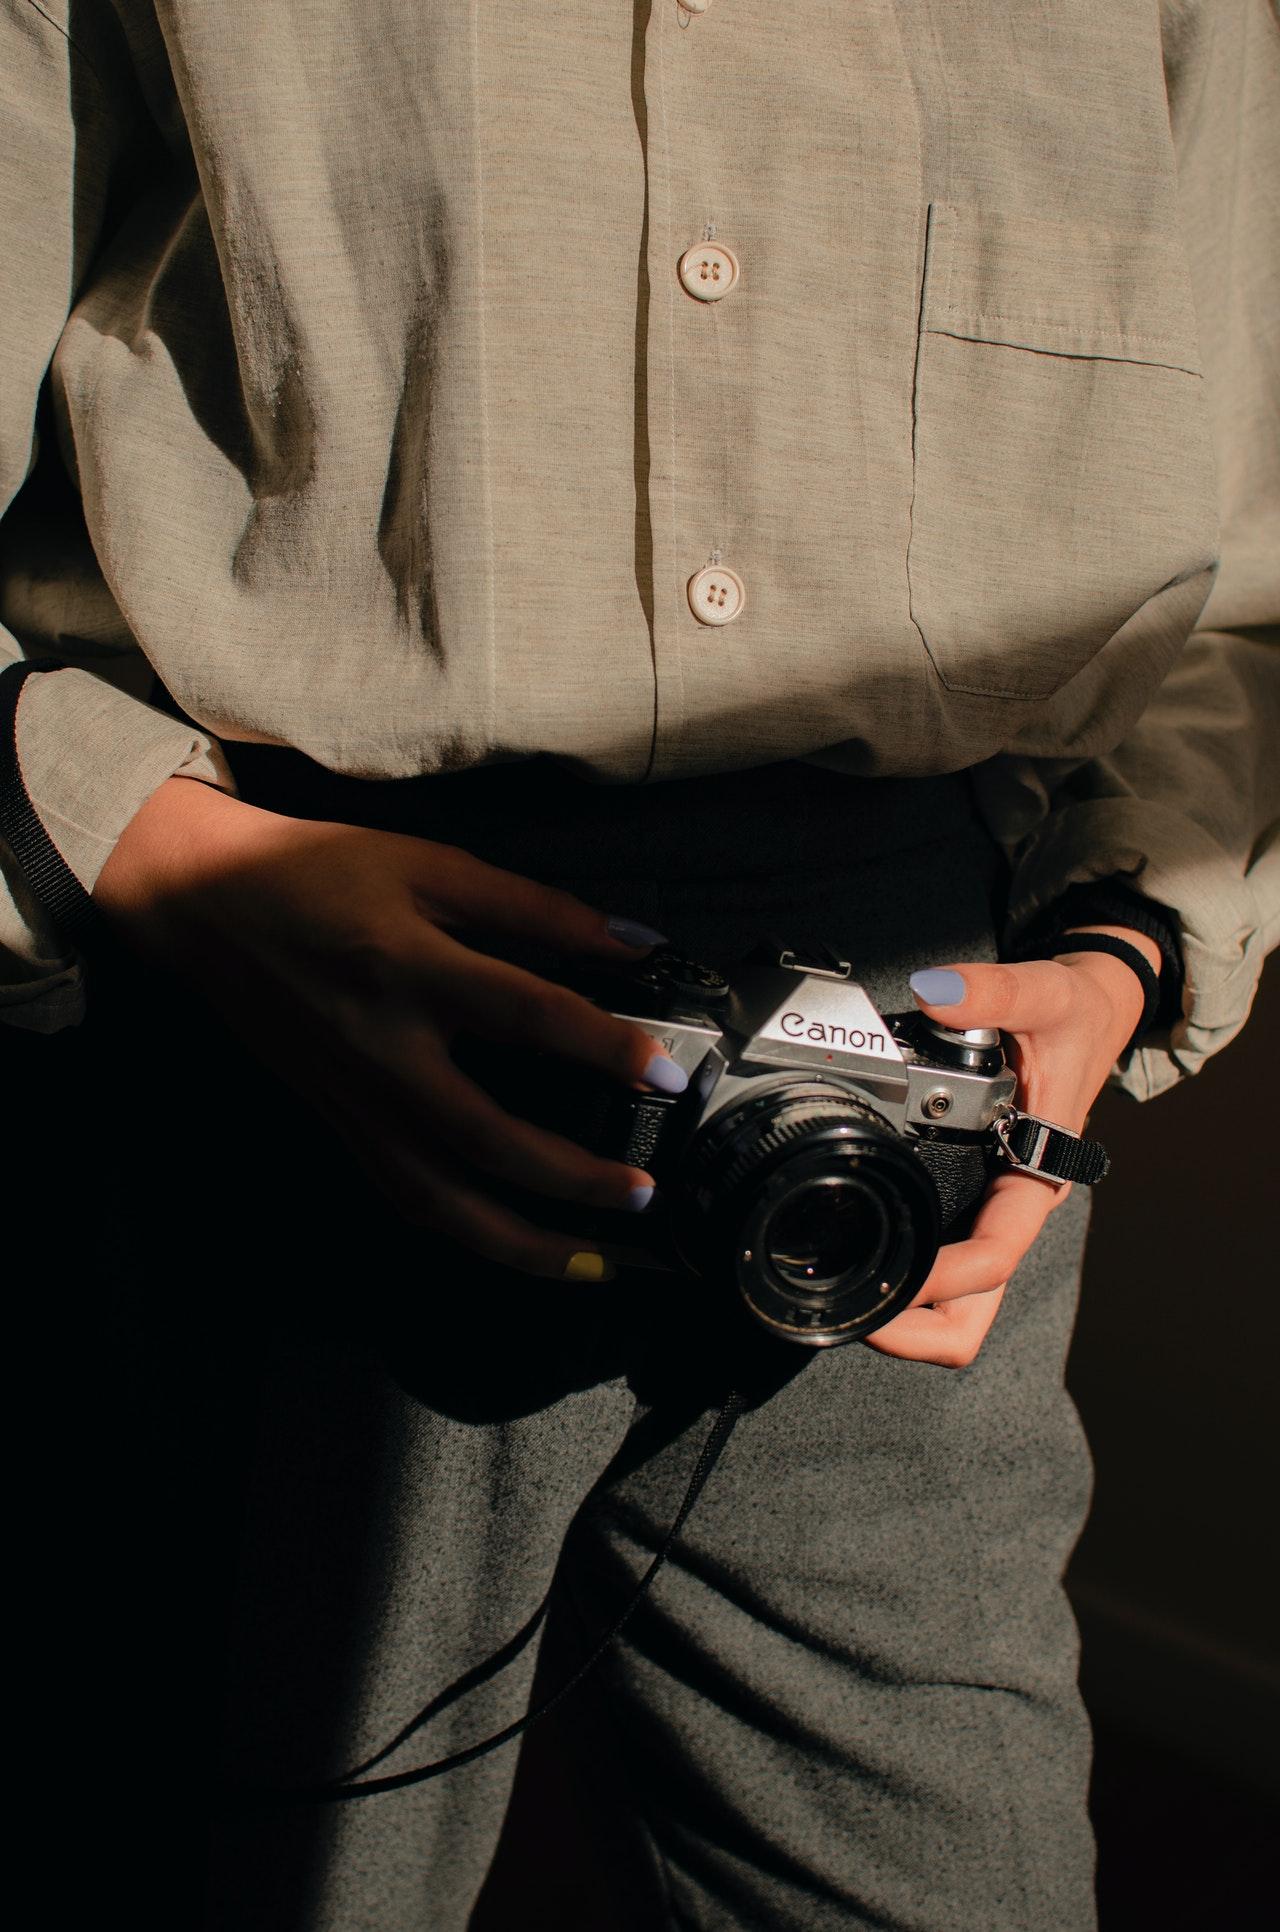 Canon Shutting Down Photo Community RAISE December 30th